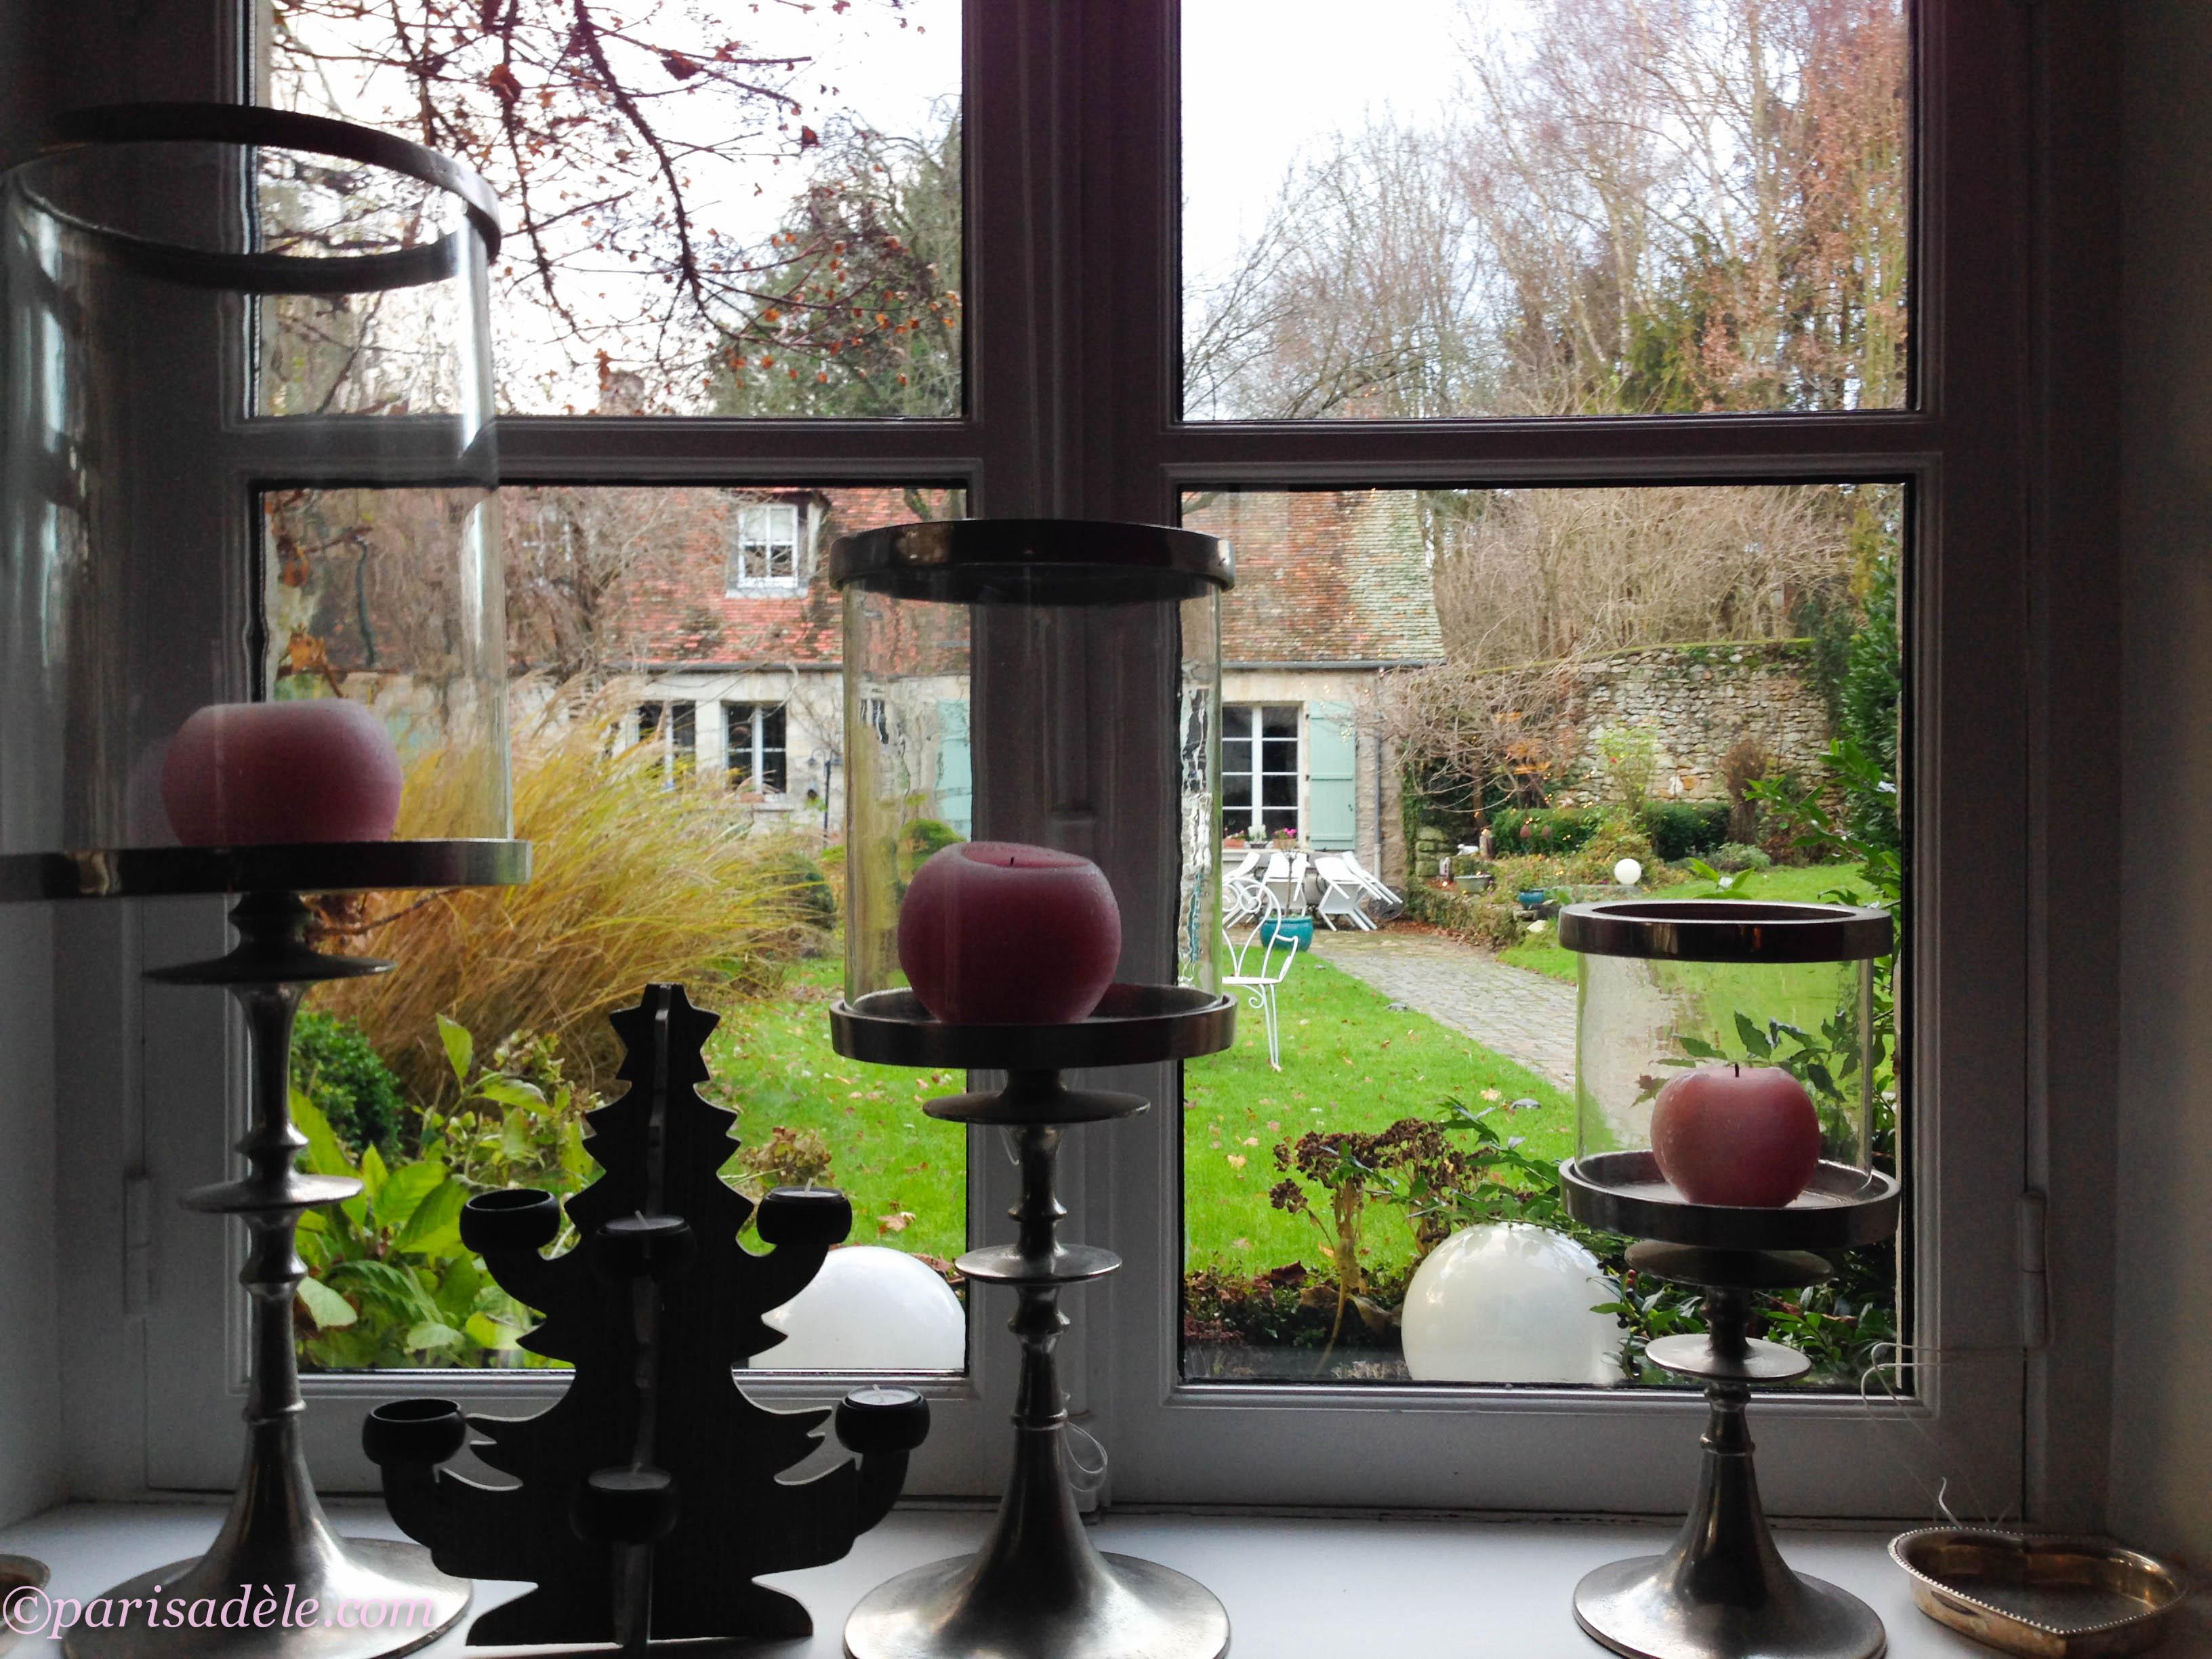 Côte Jardin | Paris Adèle